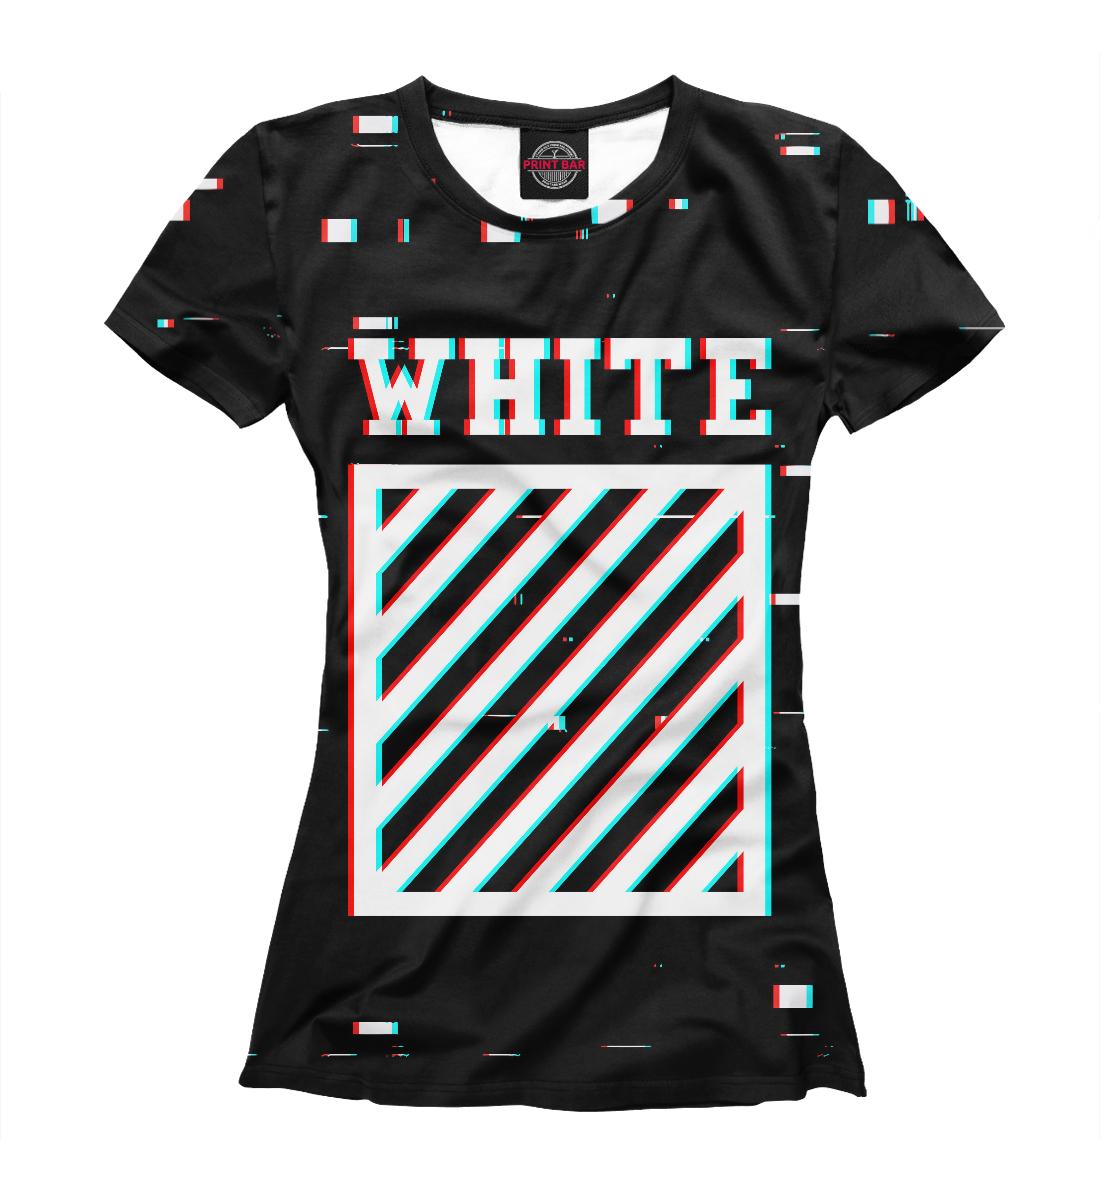 Купить Off-White Glitch, Printbar, Футболки, APD-369503-fut-1